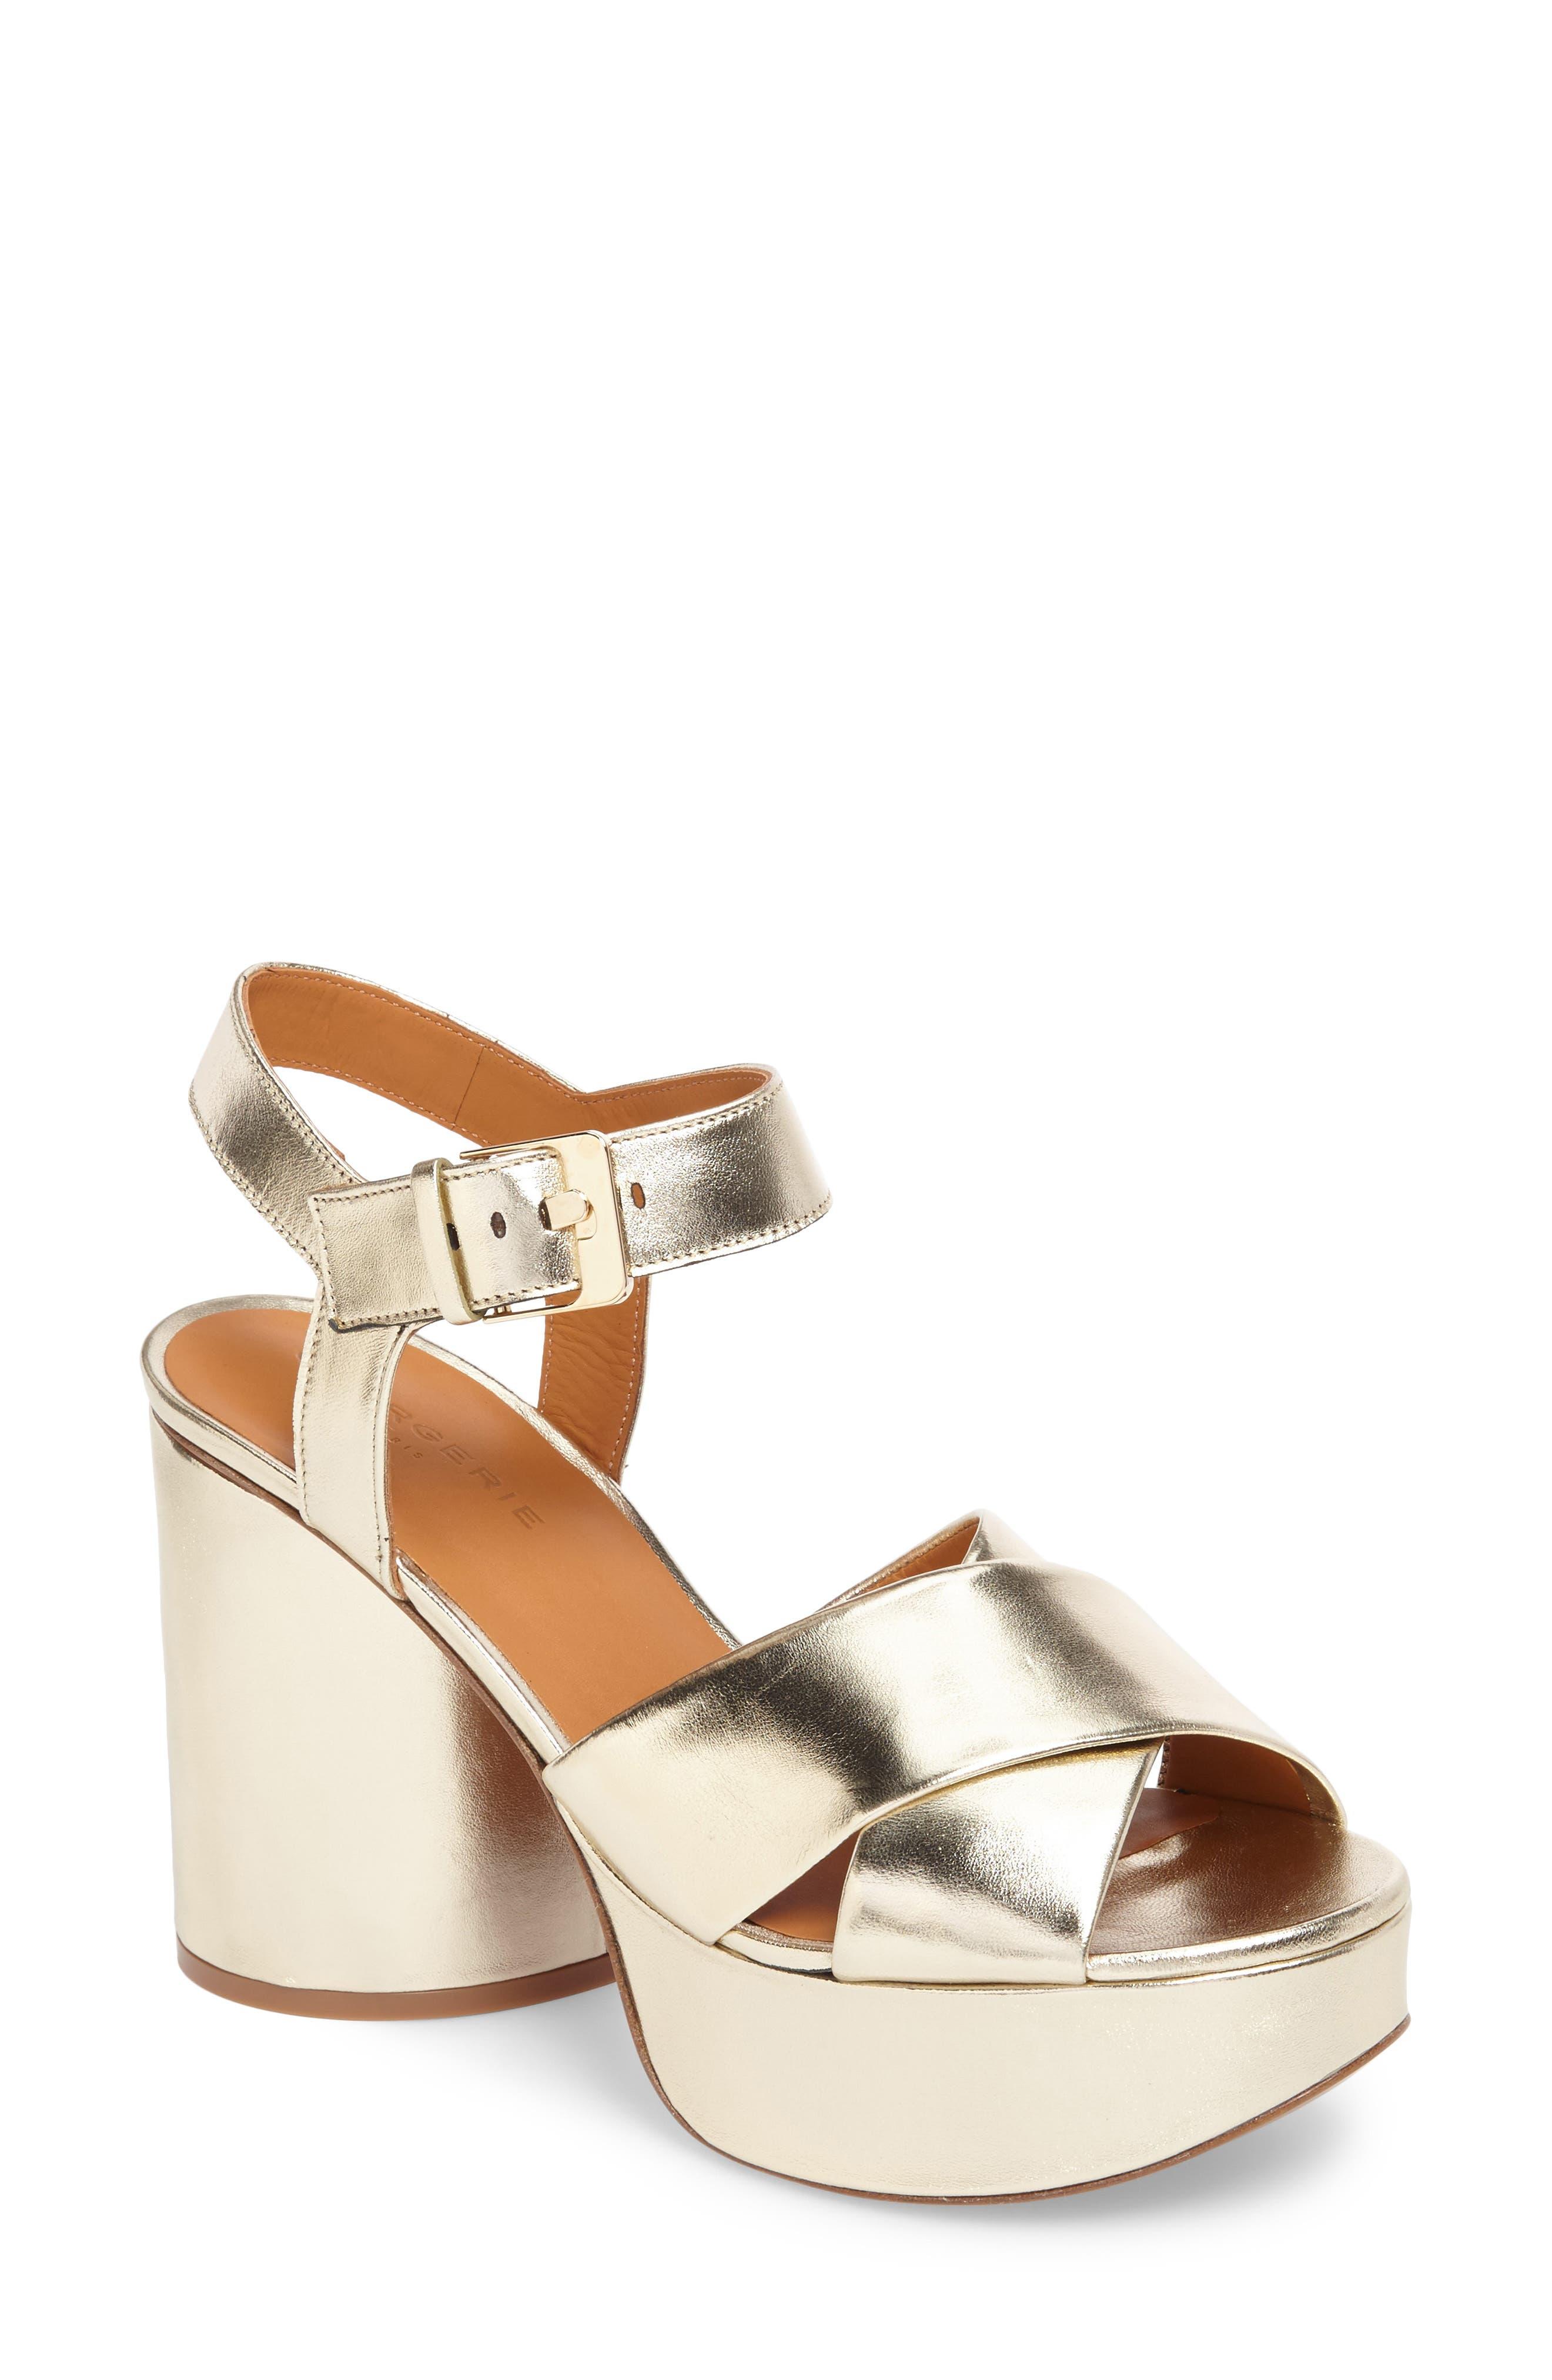 Vianne Ankle Strap Platform Sandal,                             Main thumbnail 1, color,                             Metallic Gold